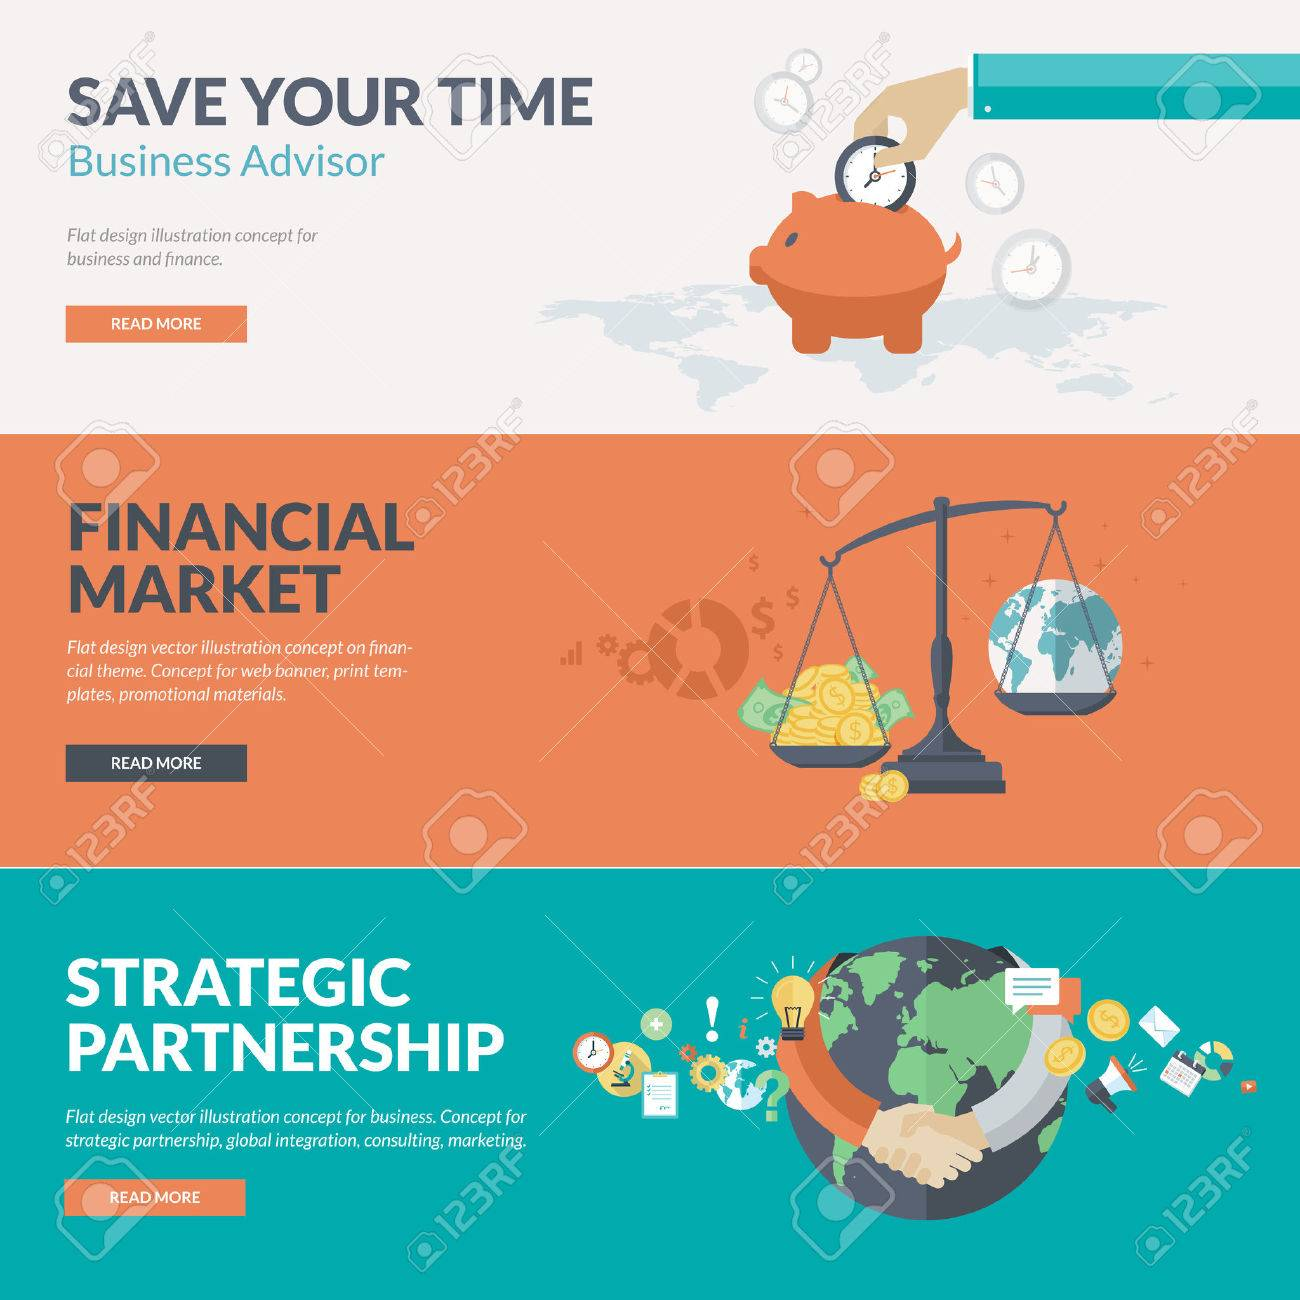 advisor stock vector illustration and royalty advisor advisor flat design vector illustration concepts for business finance business advisor consulting